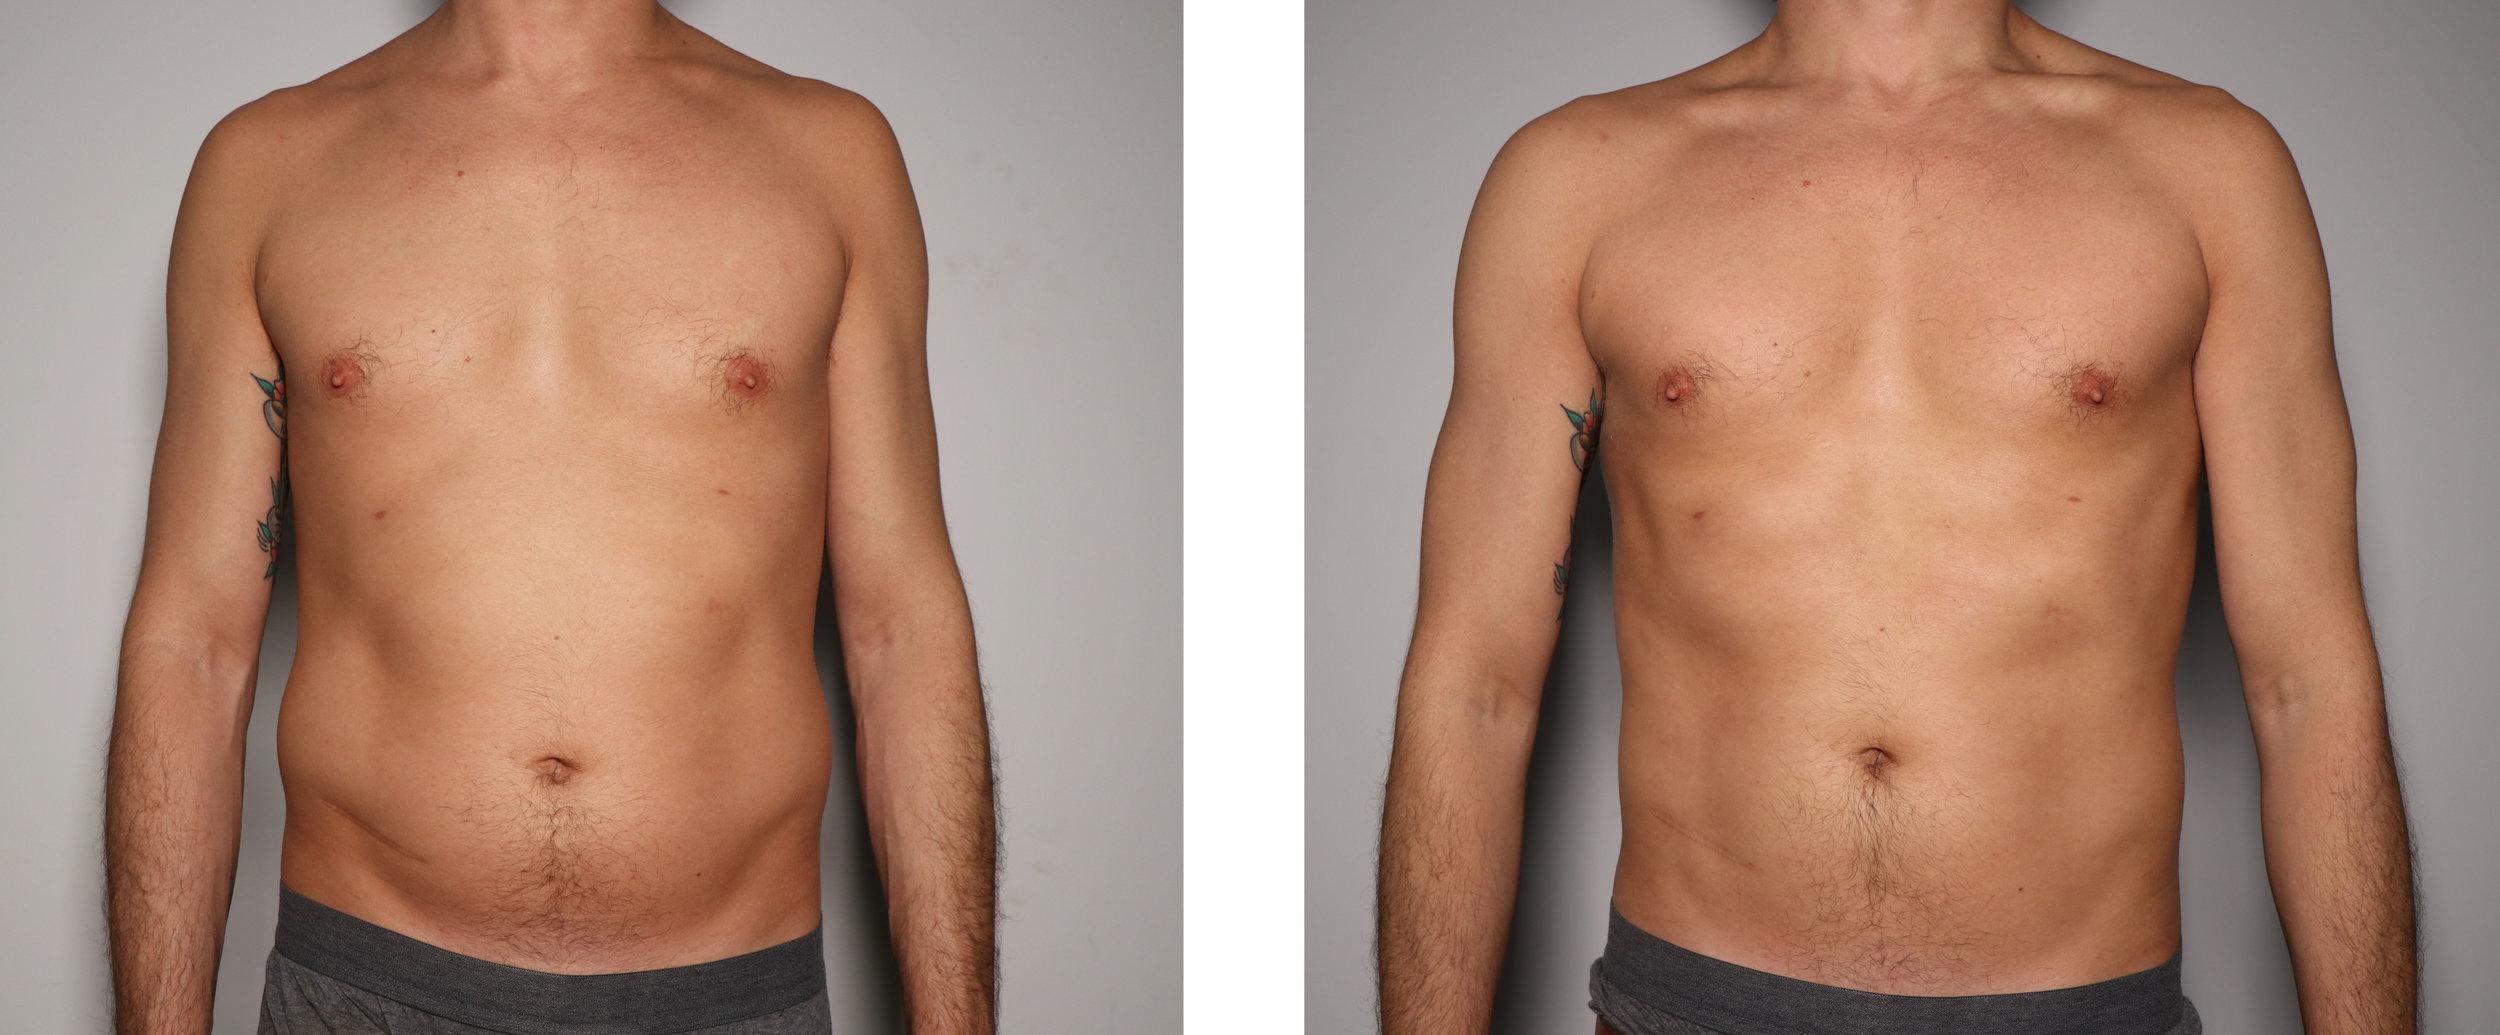 Male Stomach Toning Week 1.jpg